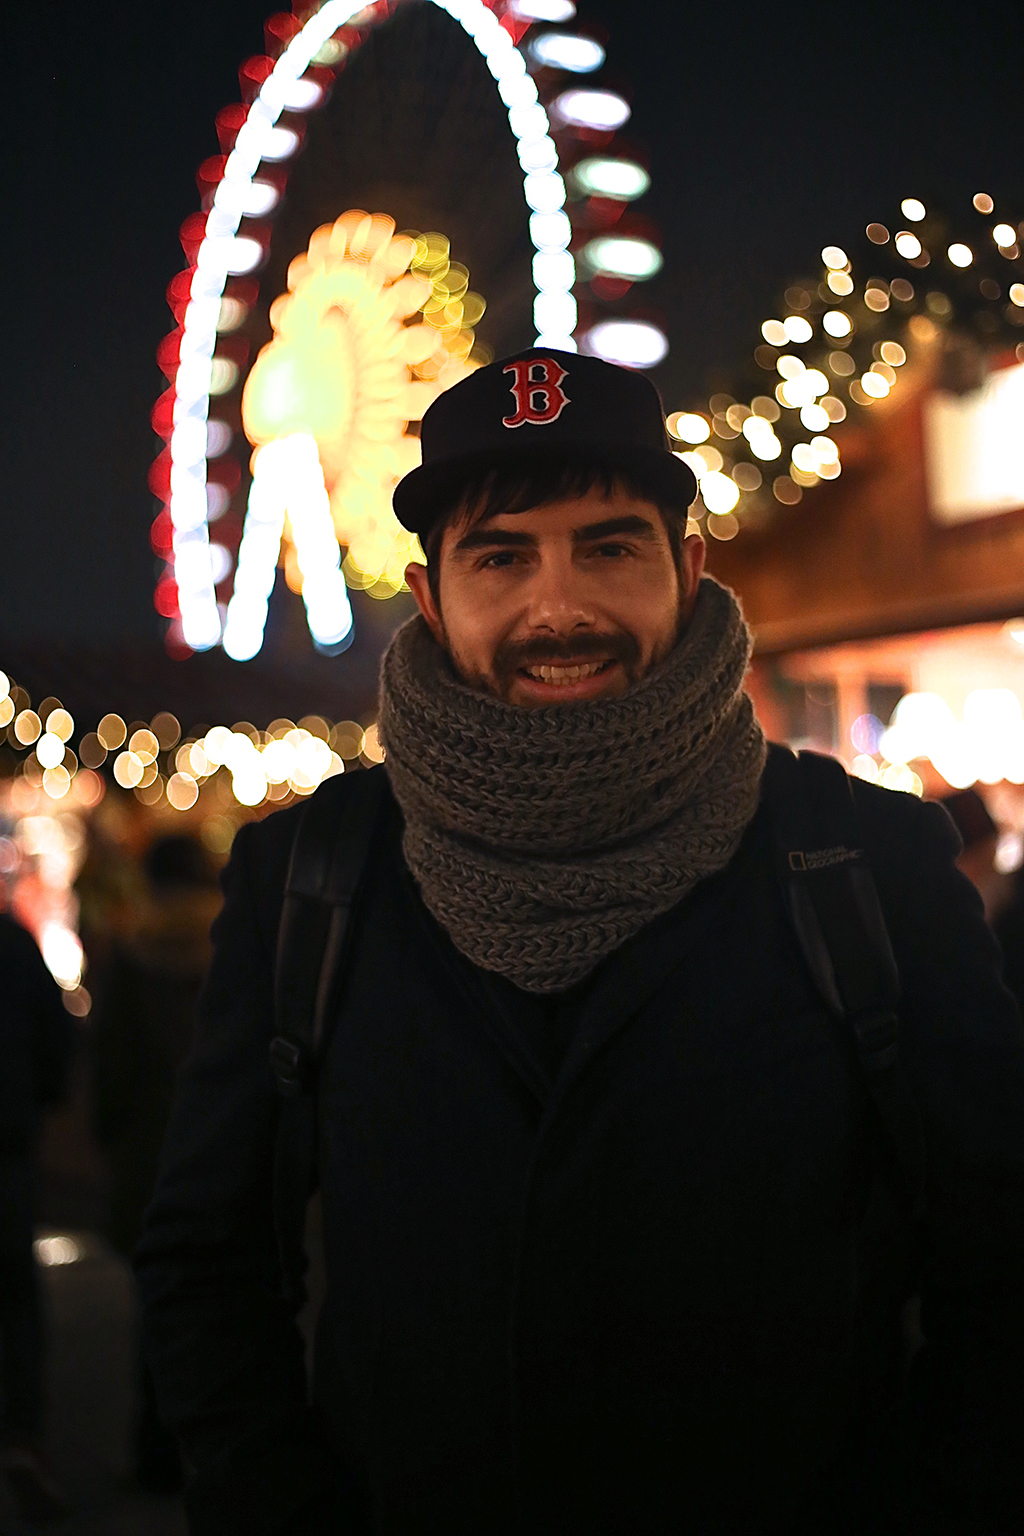 bow-tie-blue-alexanderplatz-christmas_7